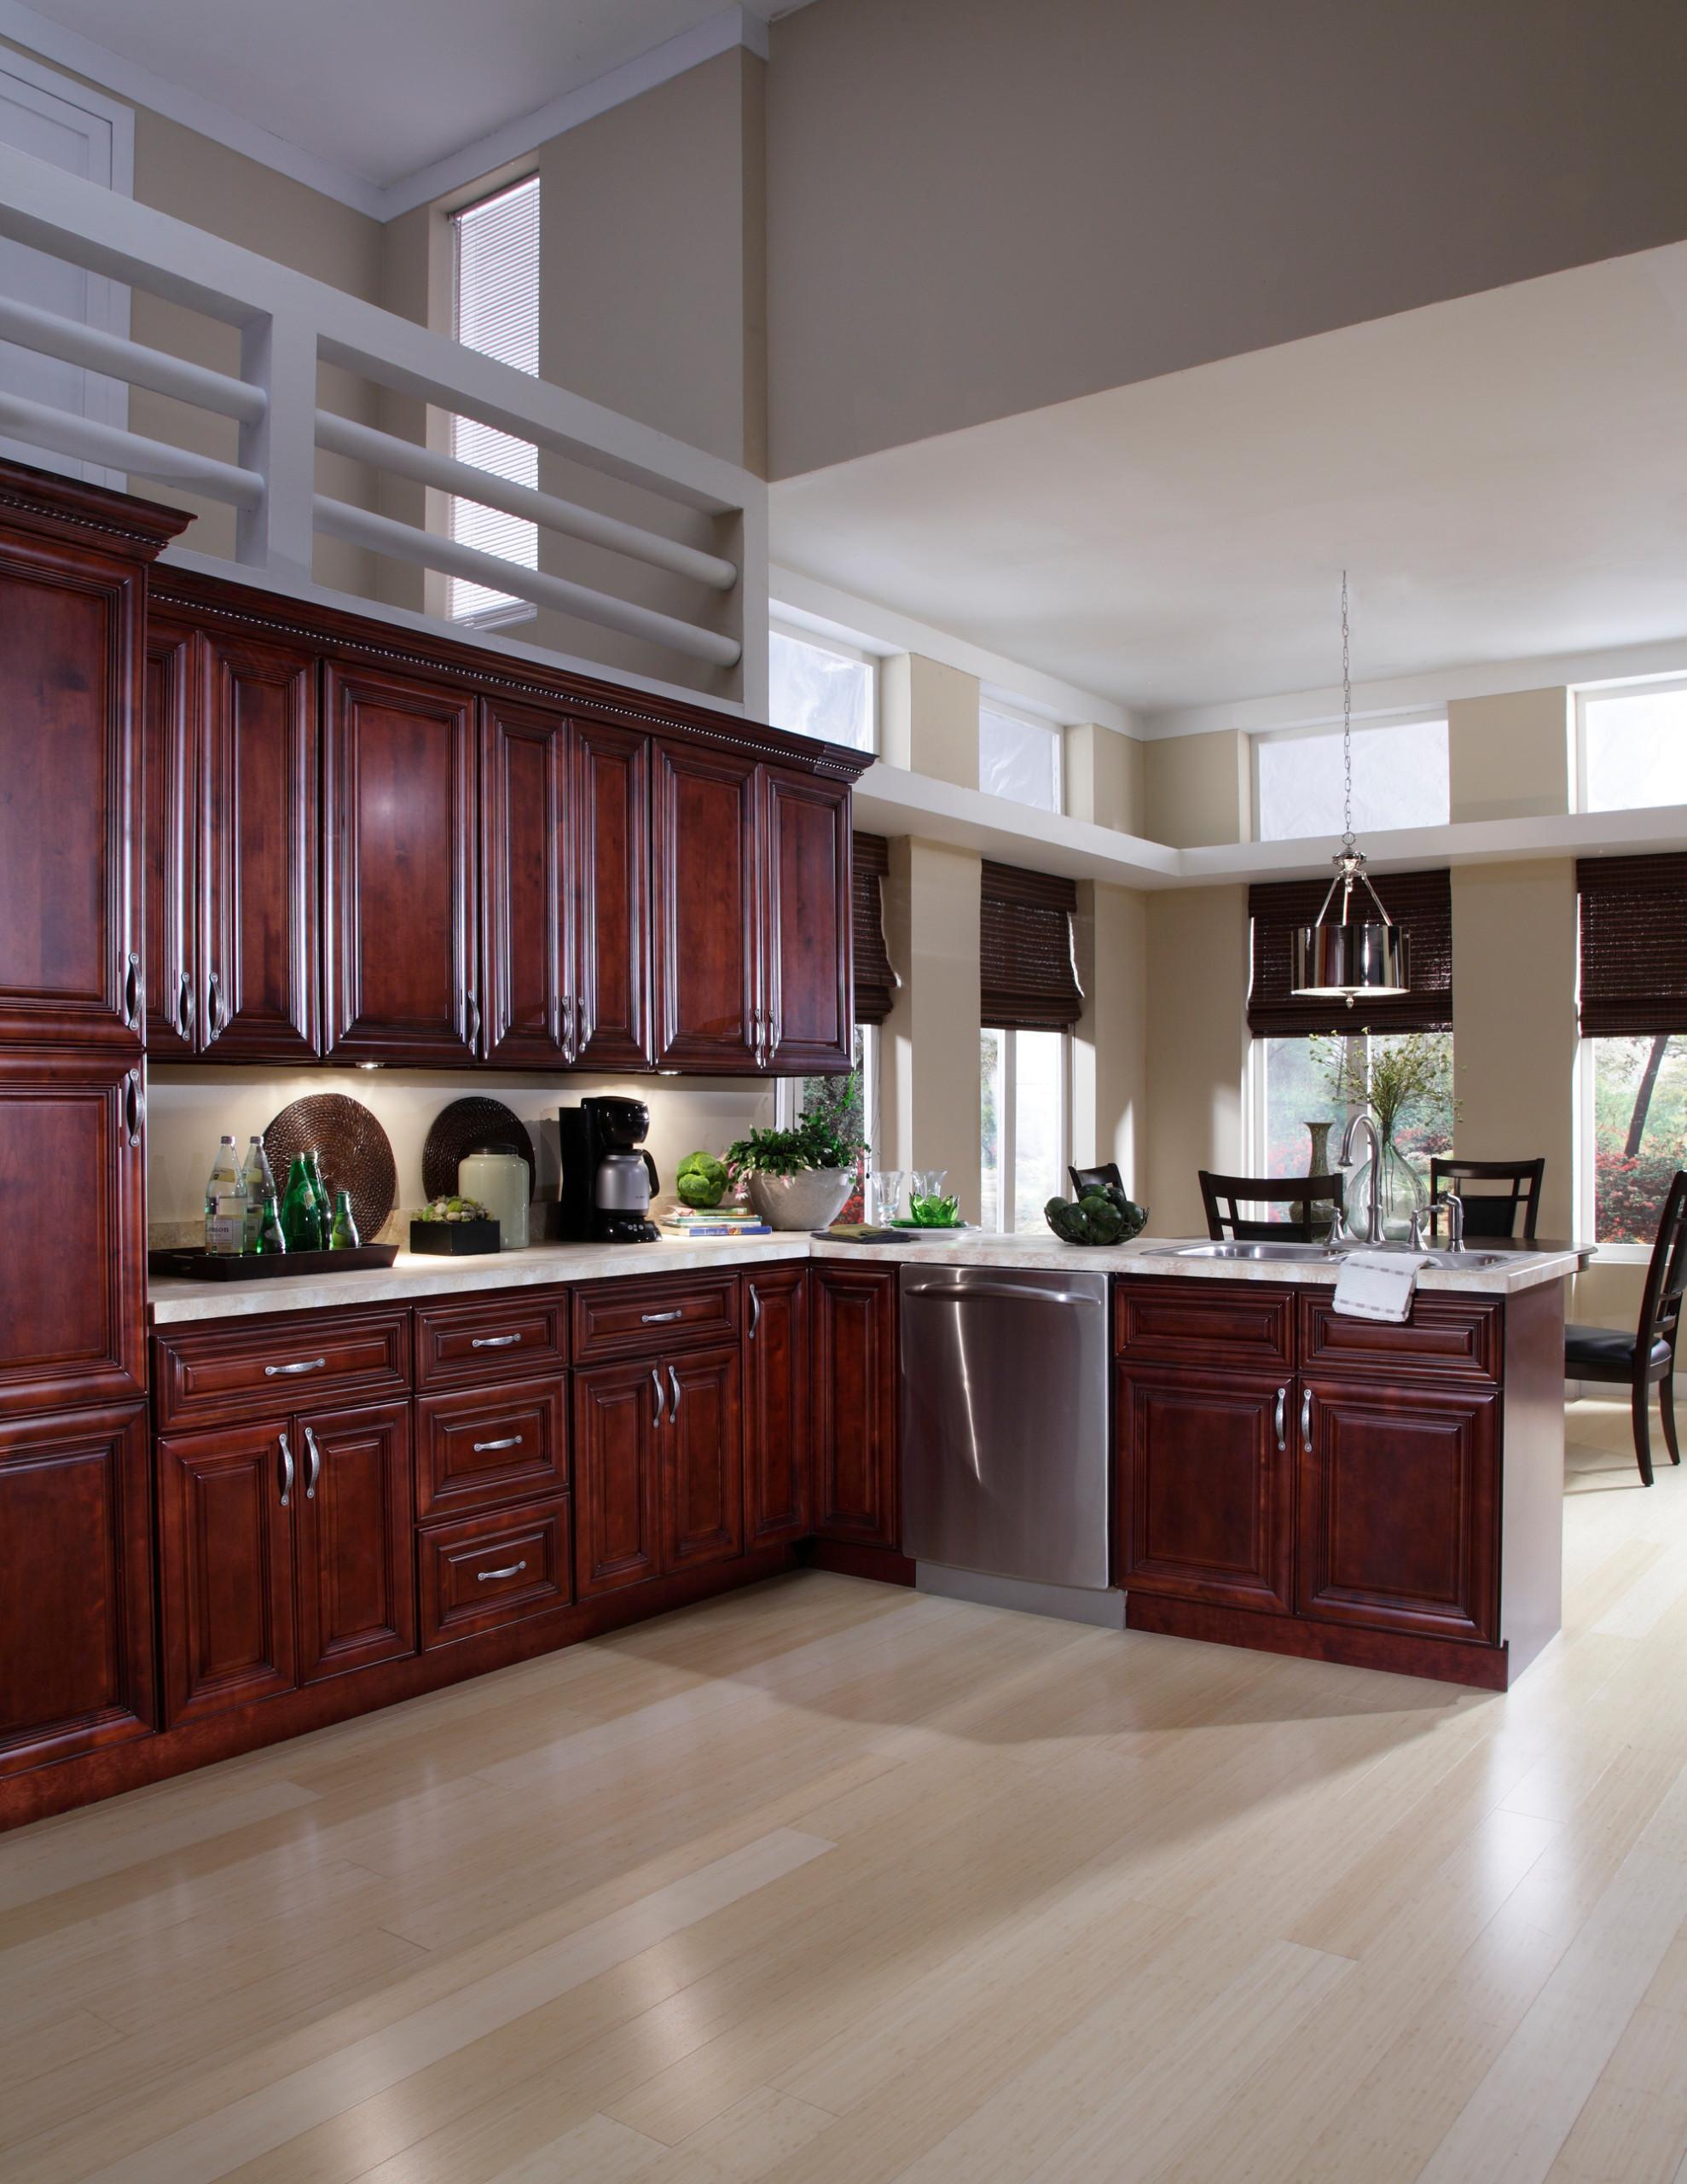 Mahogany Kitchen Cabinet Houzz